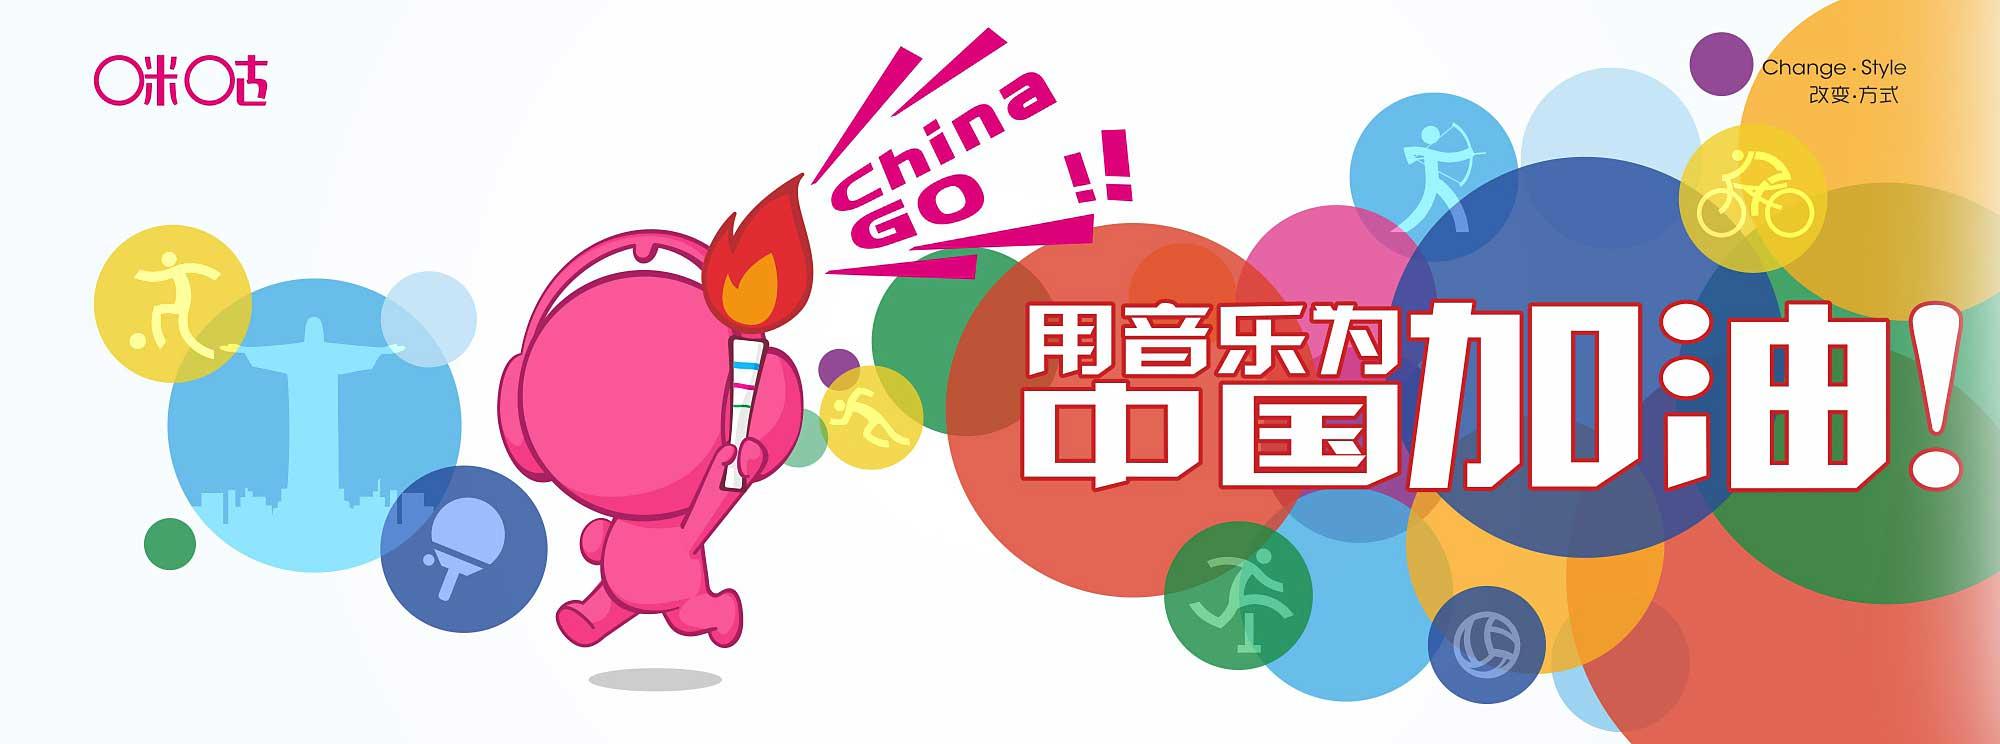 China Go!  为中国加油…